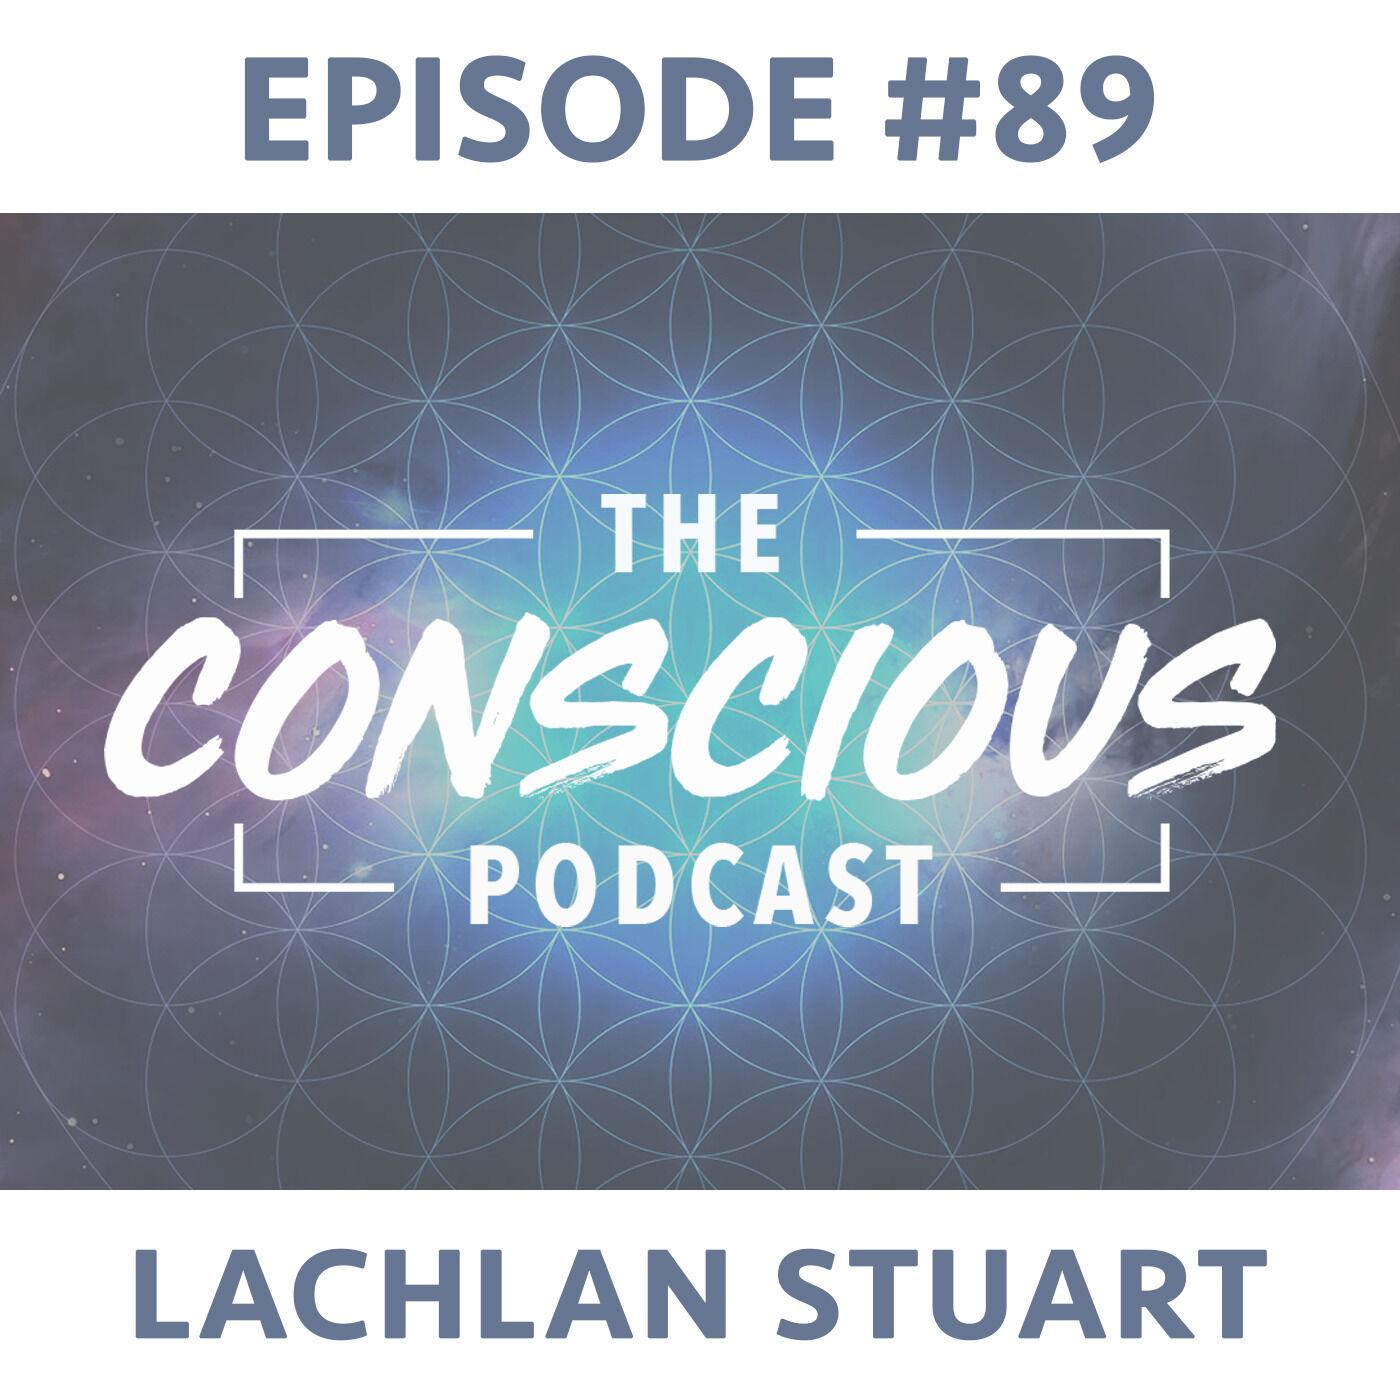 #89 - Lachlan Stuart on Identity, Finding Fulfilment & Empowering Men.